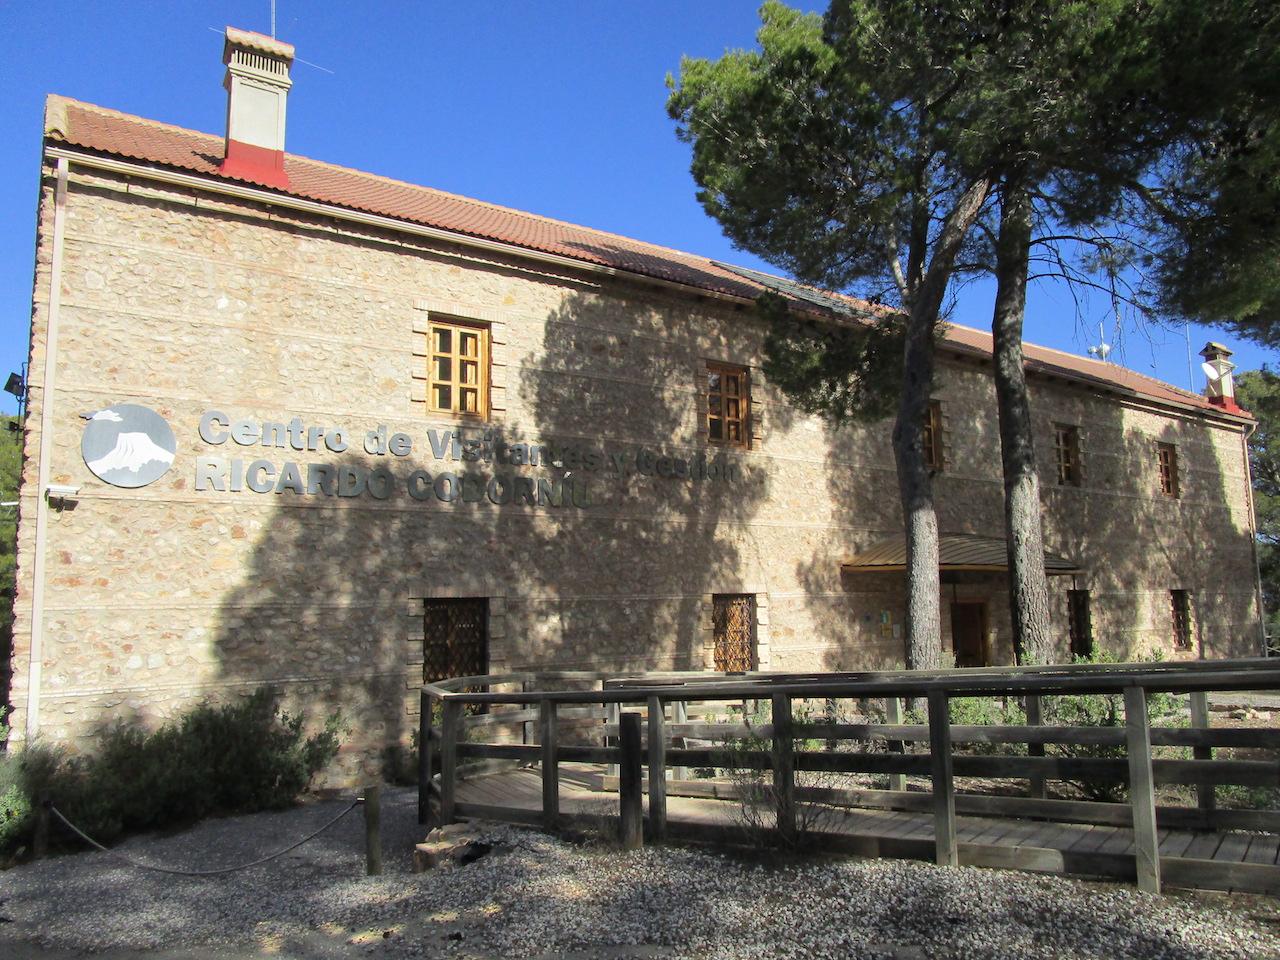 Centro de Visitantes Ricardo Codorniu